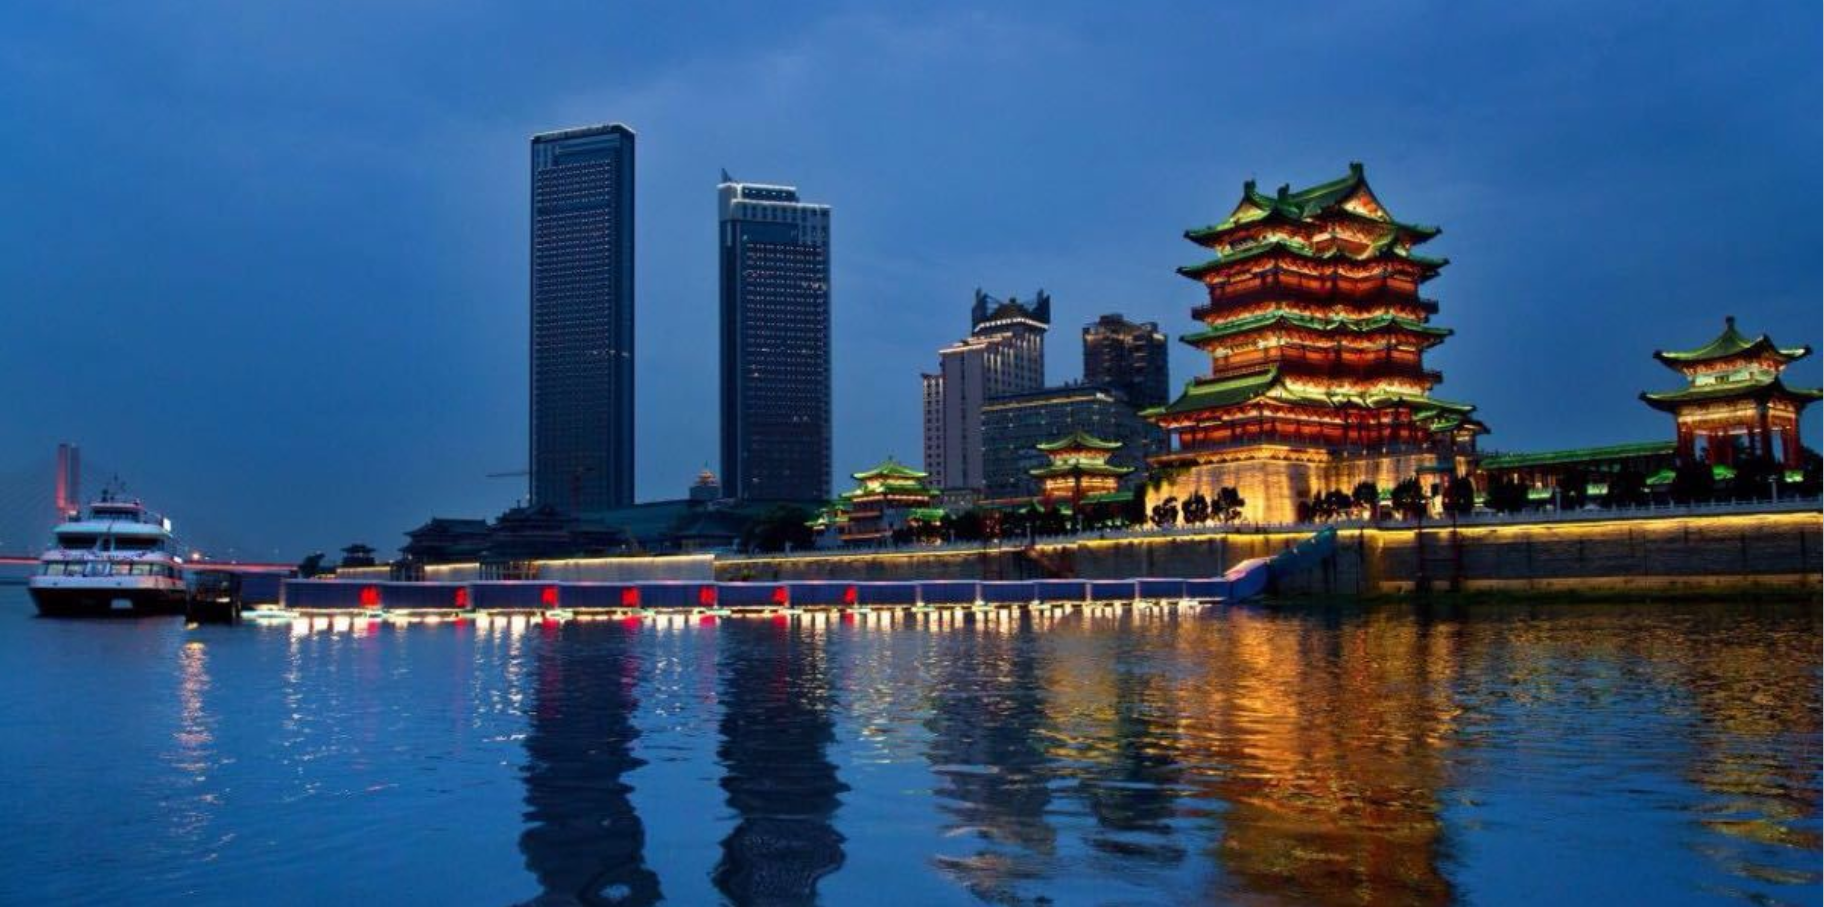 NanChang(南昌)